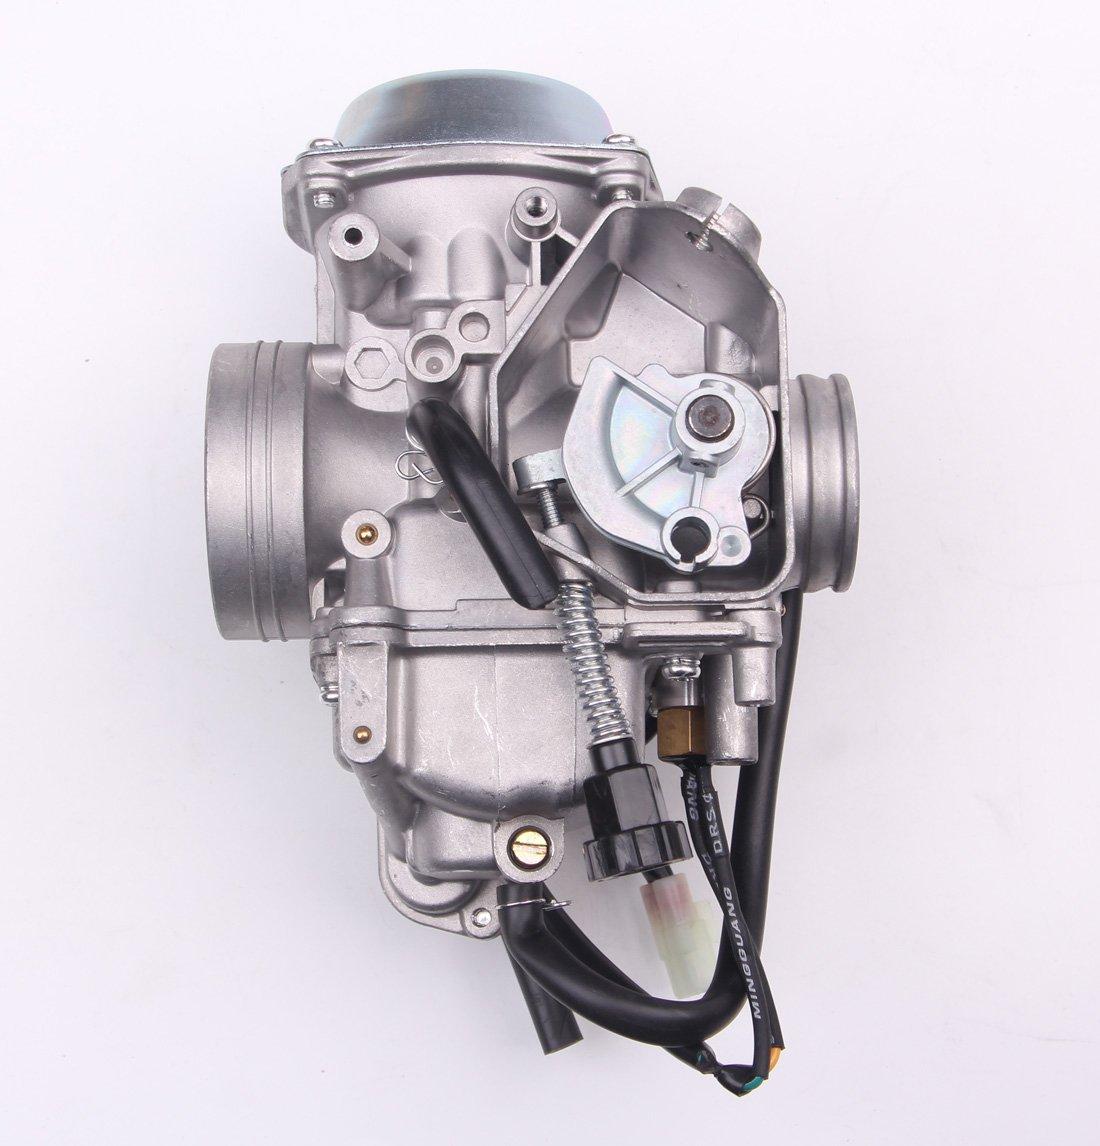 New CARB CARBURETOR For Honda TRX450 Foreman 450 2002 2003 2004 16100-HN0-672 BH-Motor